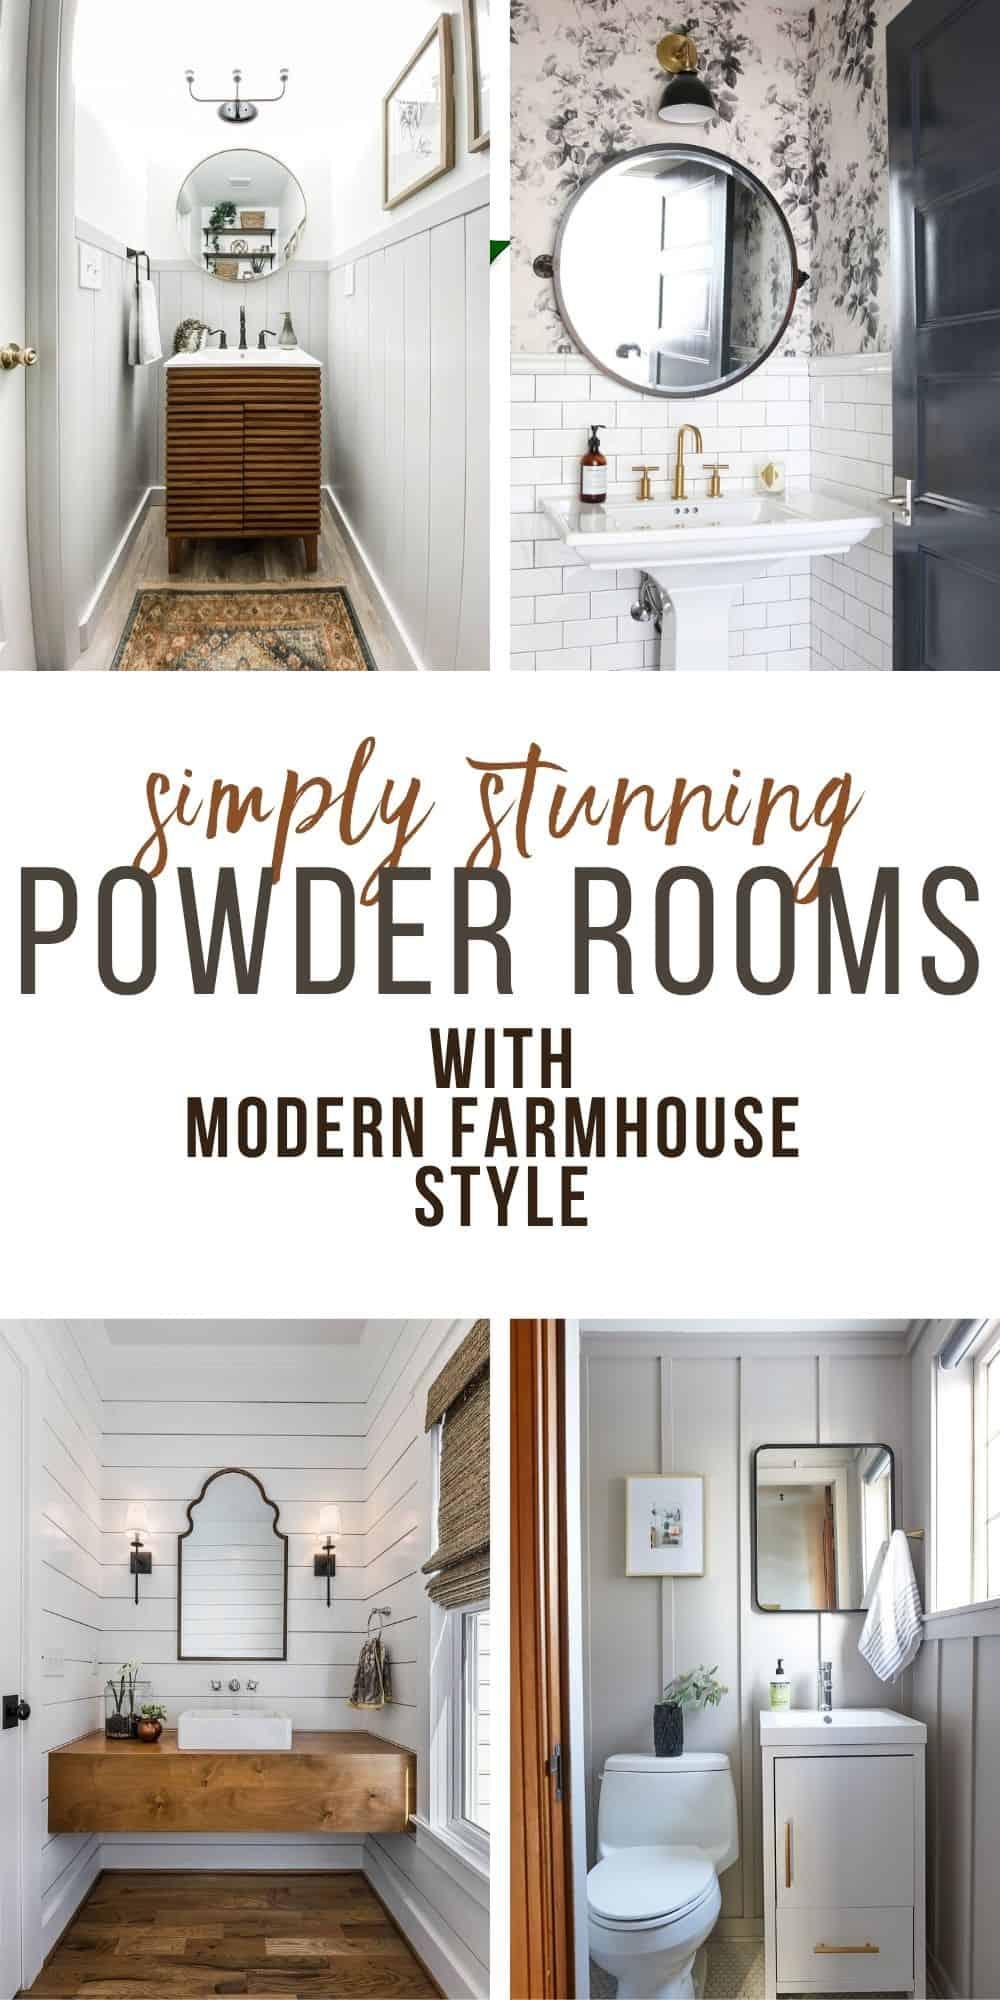 Powder Room Ideas with Modern Farmhouse Boho Style